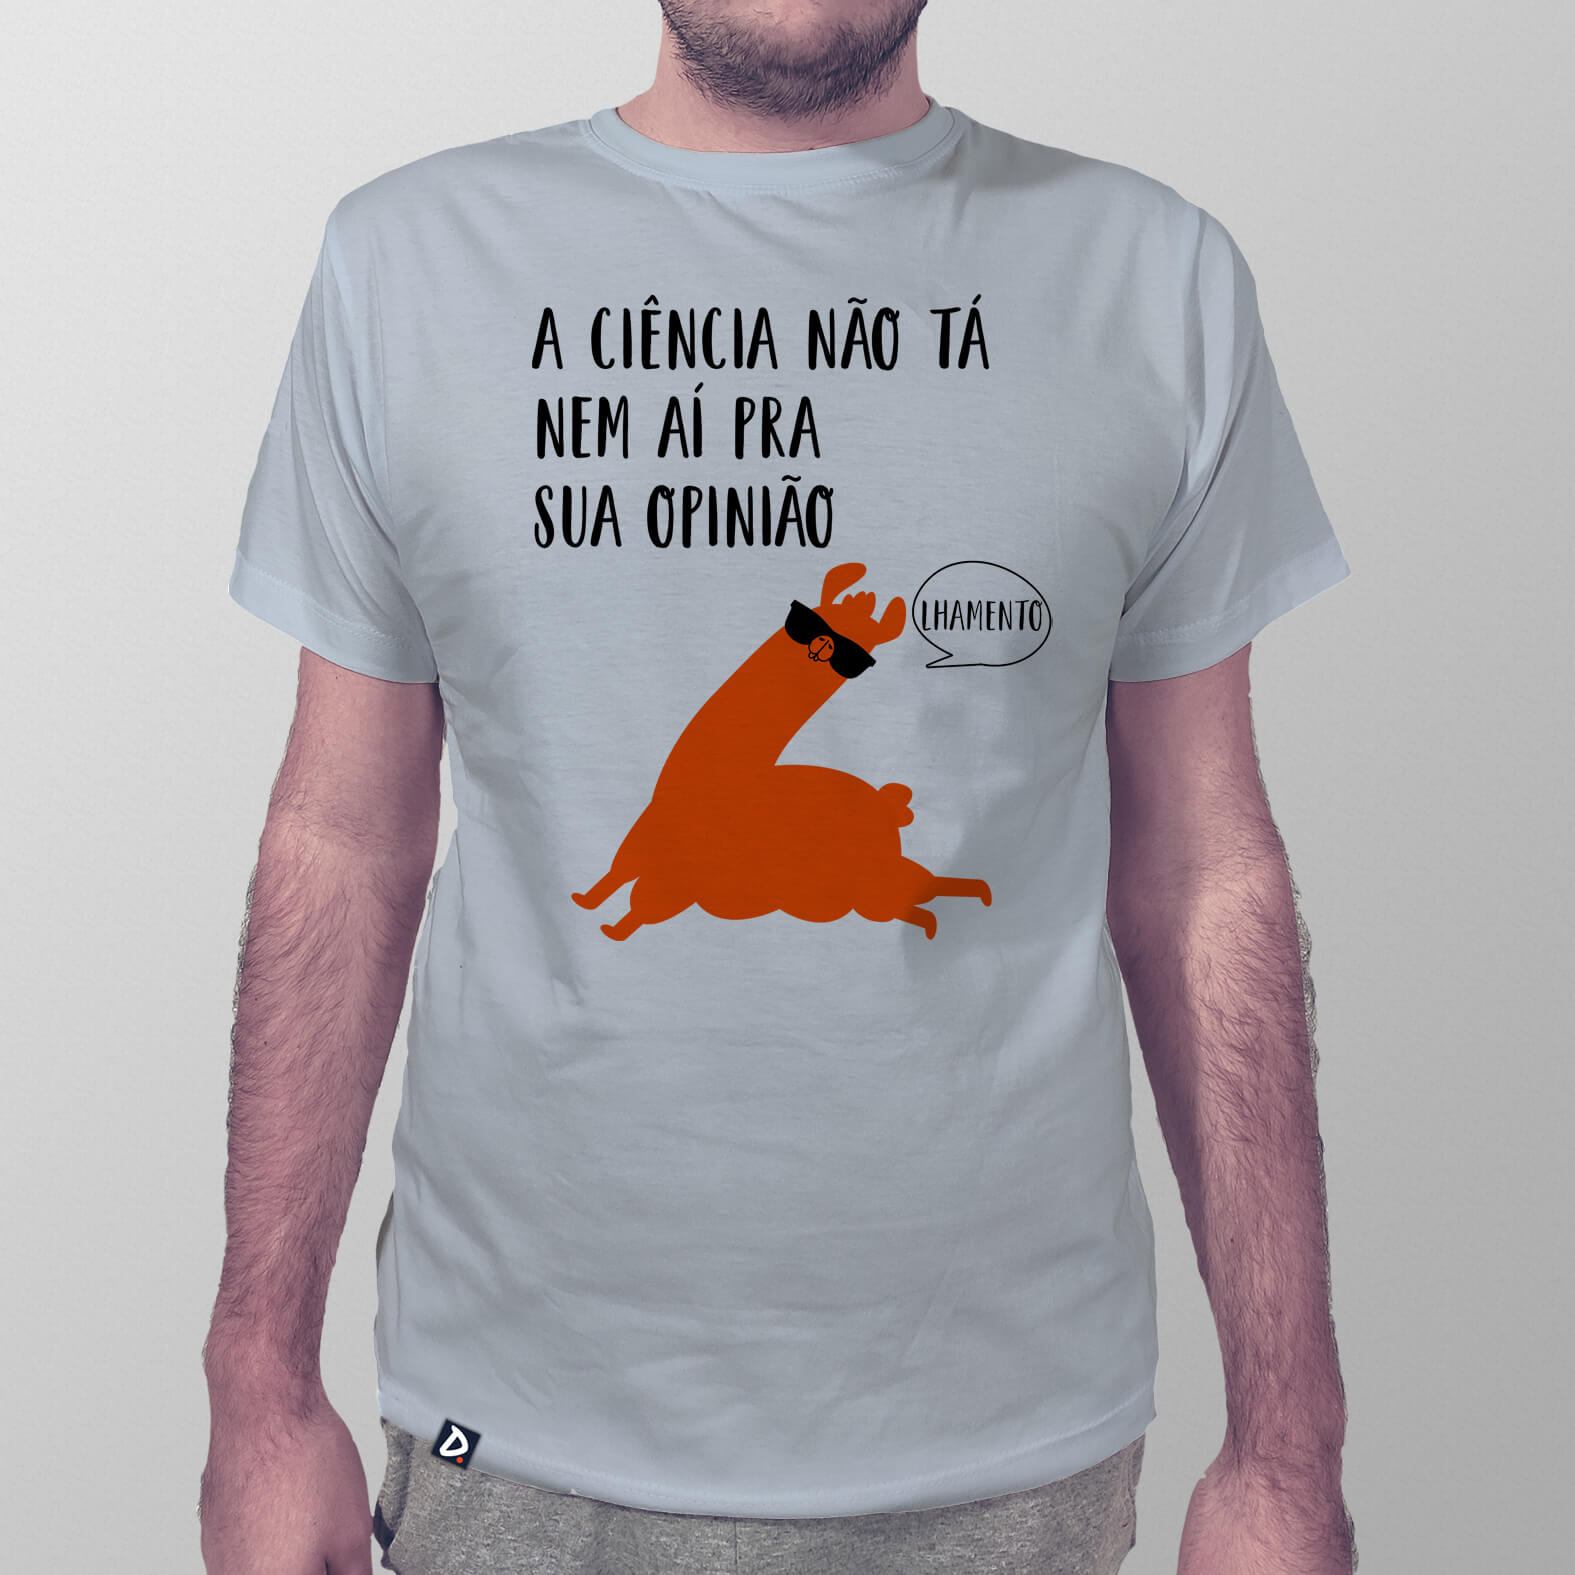 Camiseta Masculina Ciência e Opinião Lhama Edition